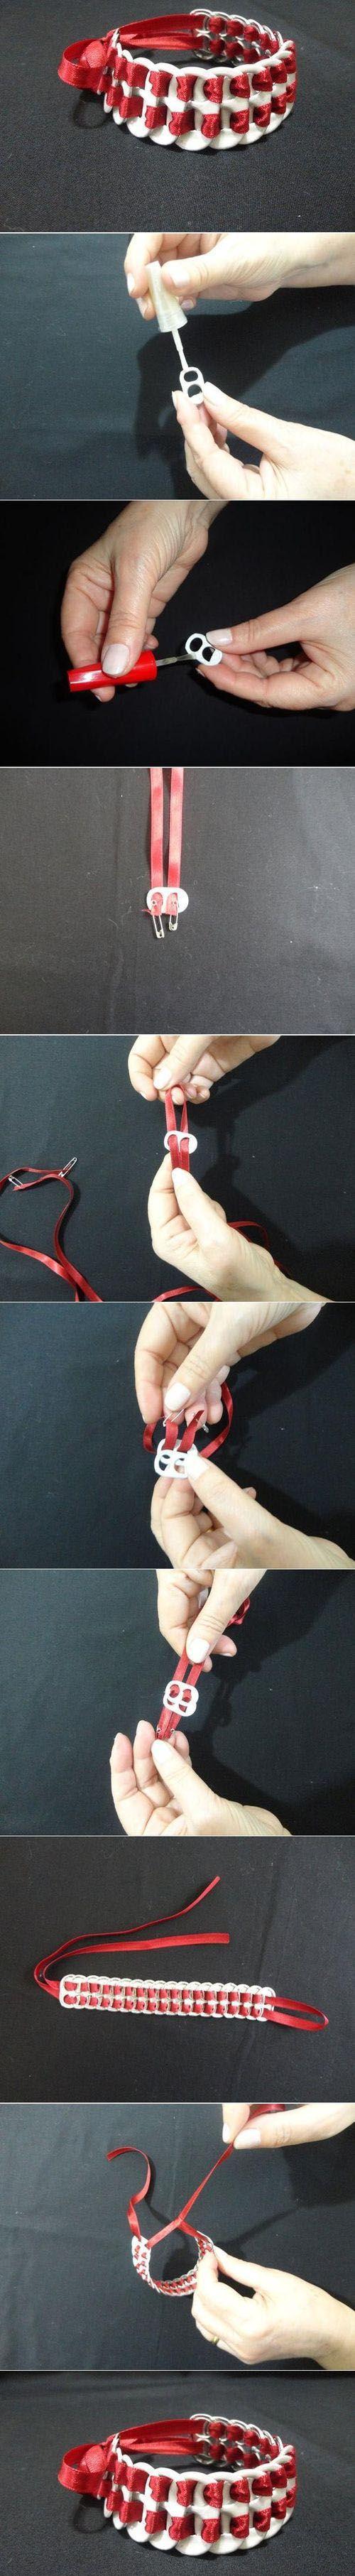 Cool Bracelet | DIY & Crafts Tutorials